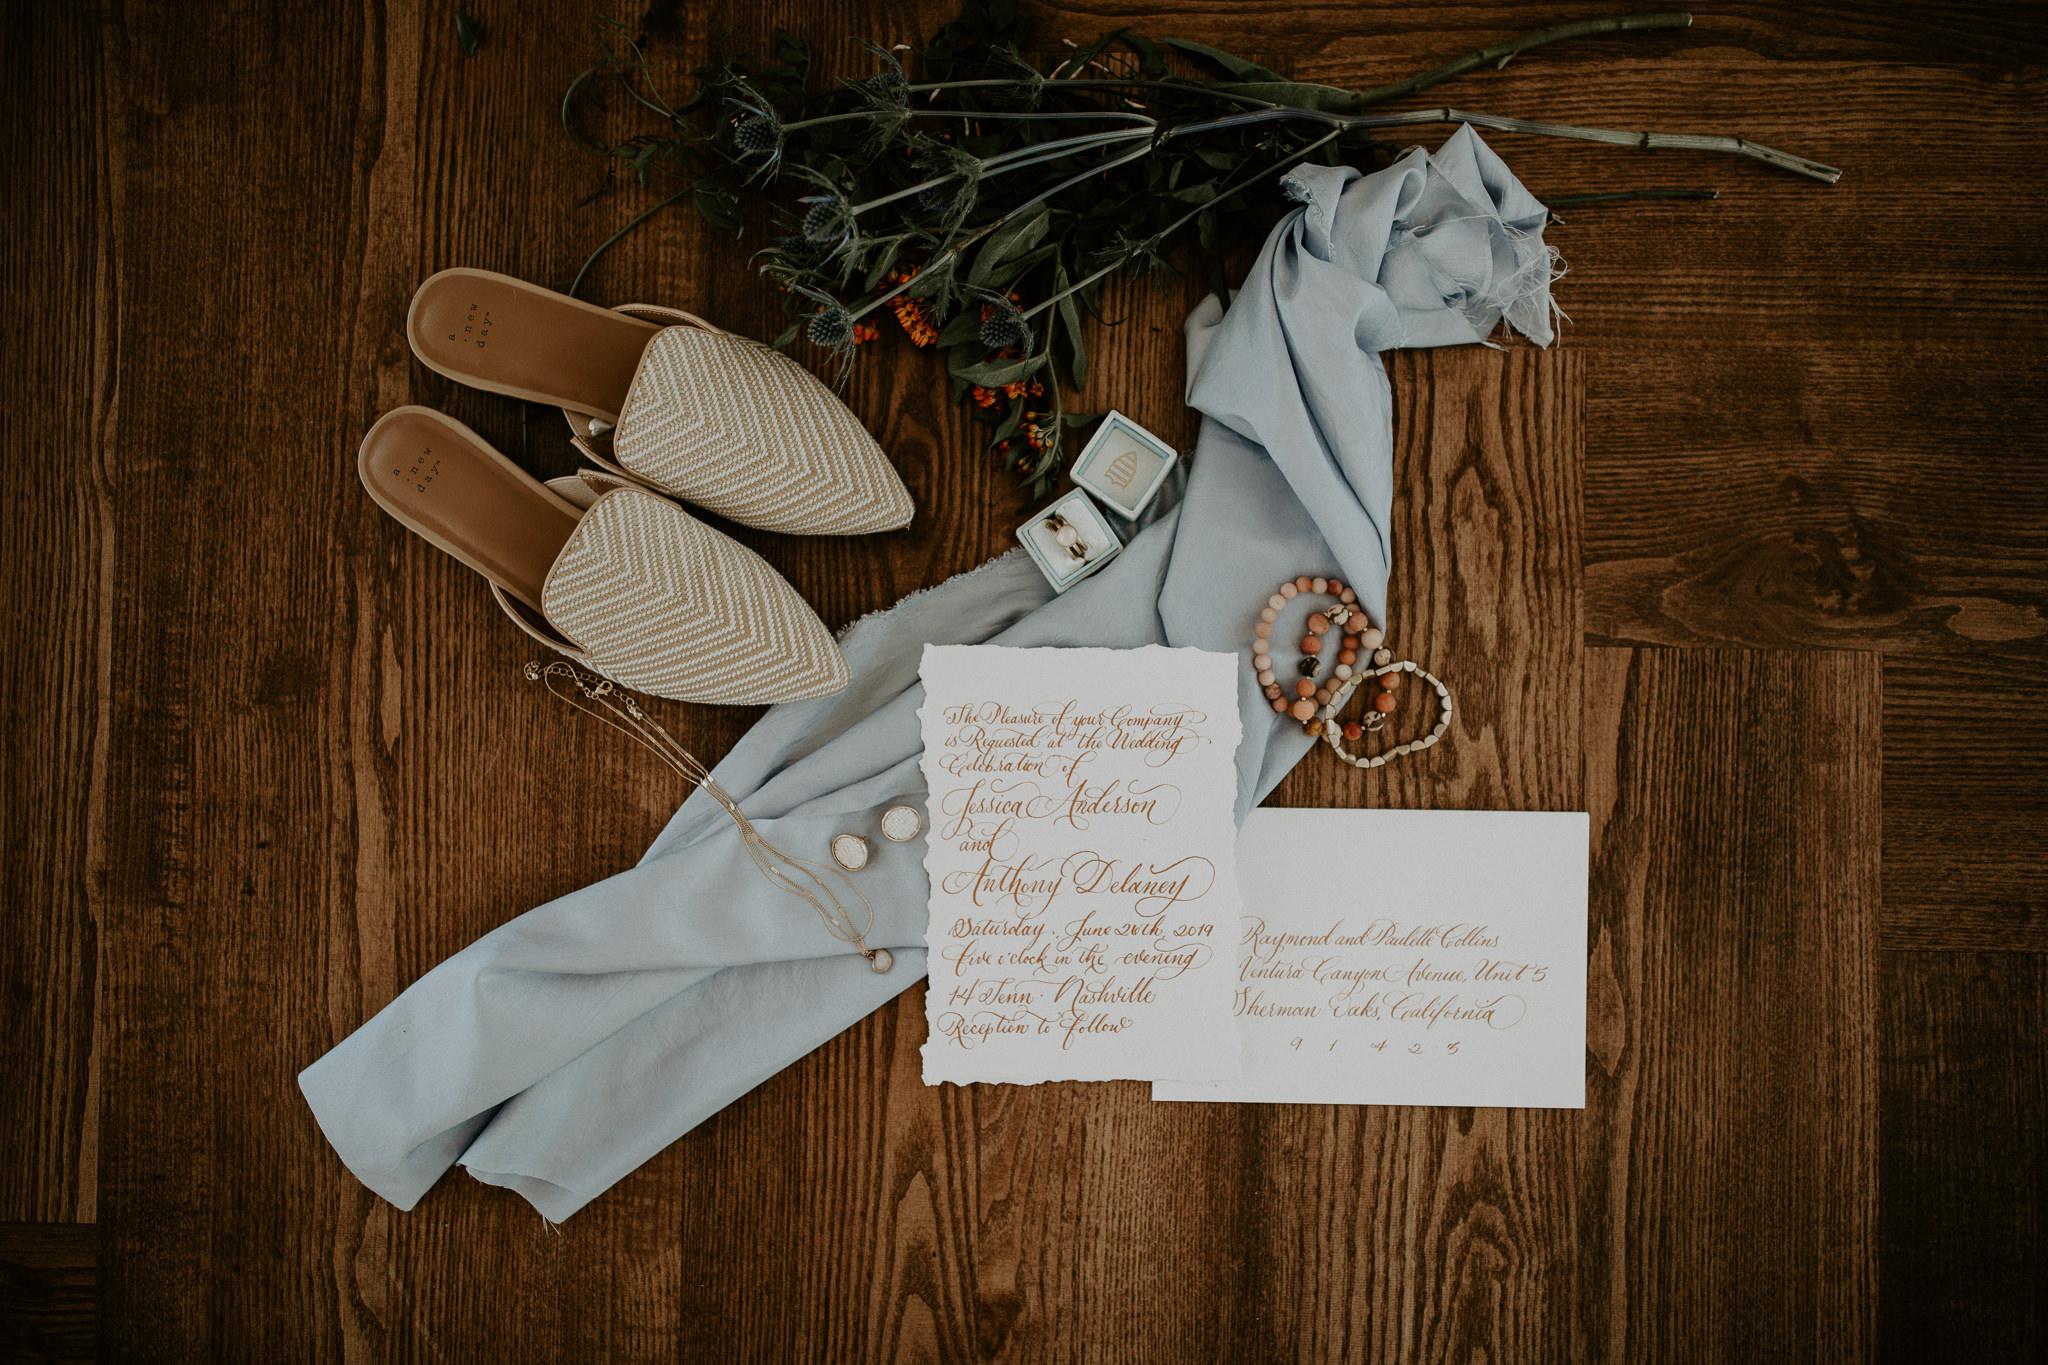 Wedding vows flat lay